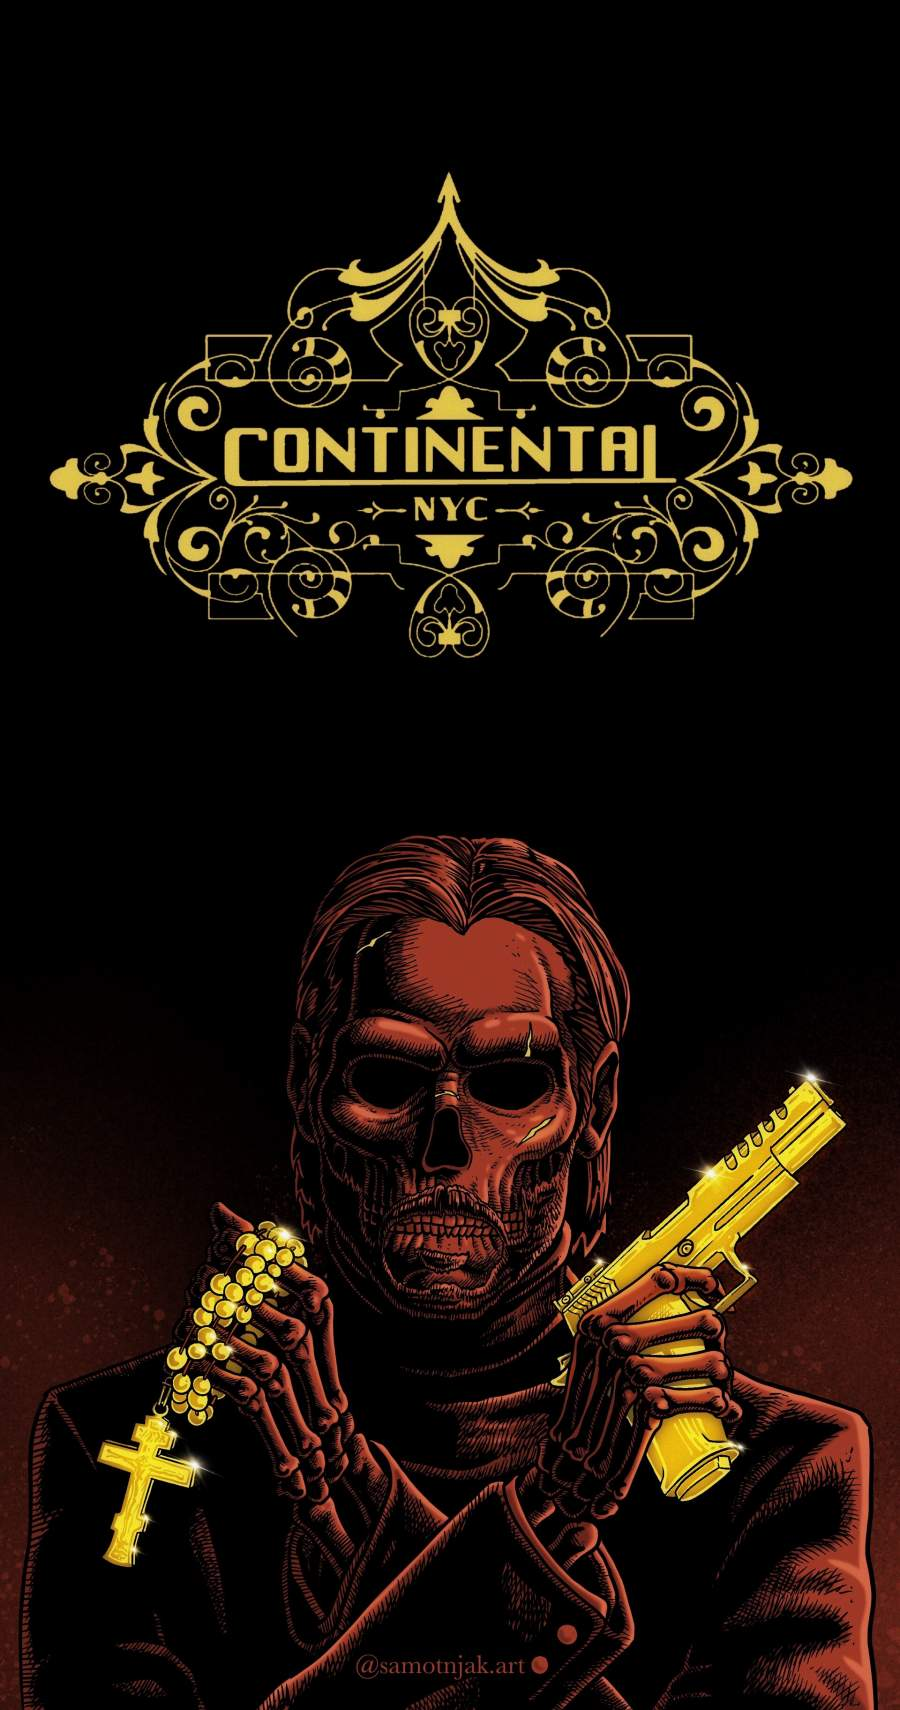 John Wick Continental